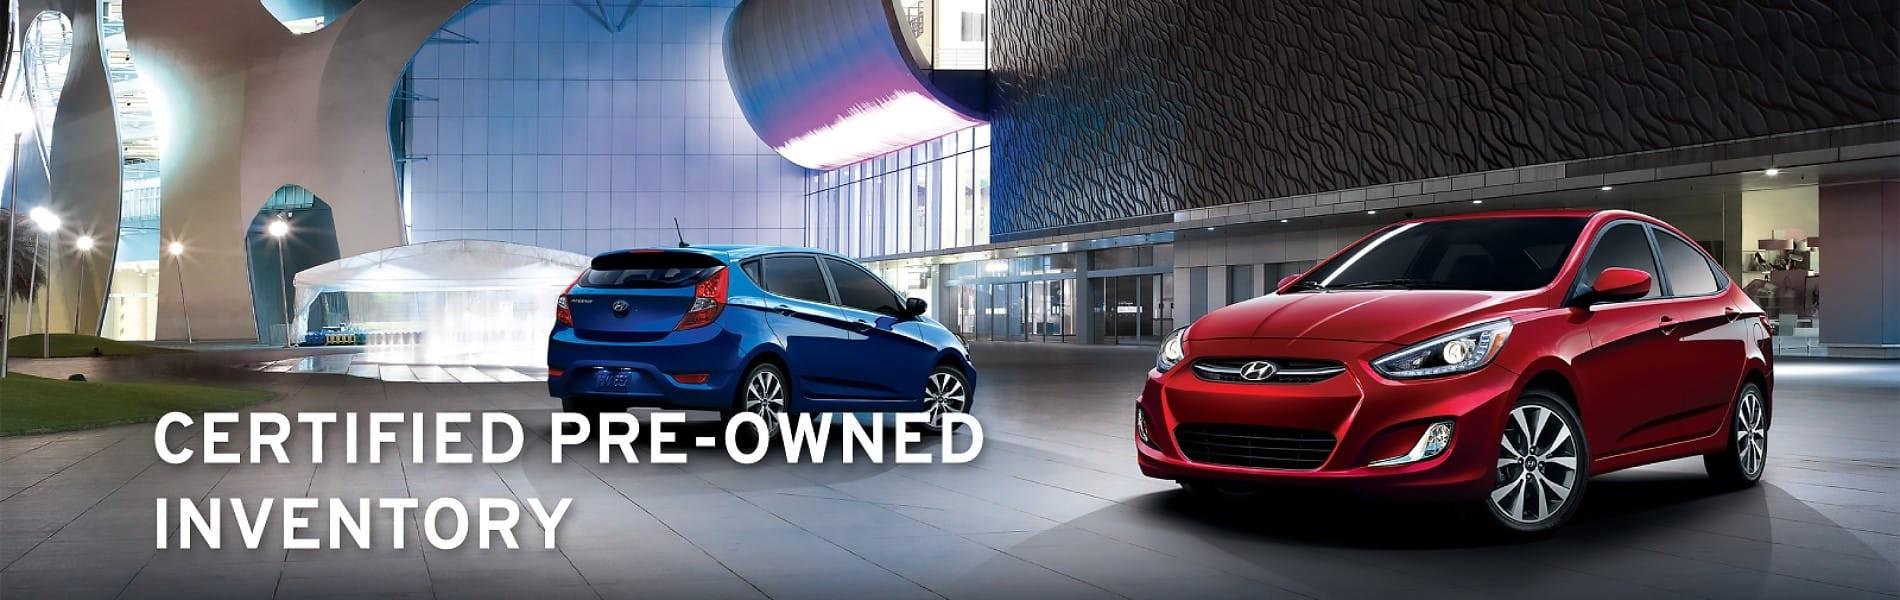 Knauz Hyundai Certified Pre-Owned